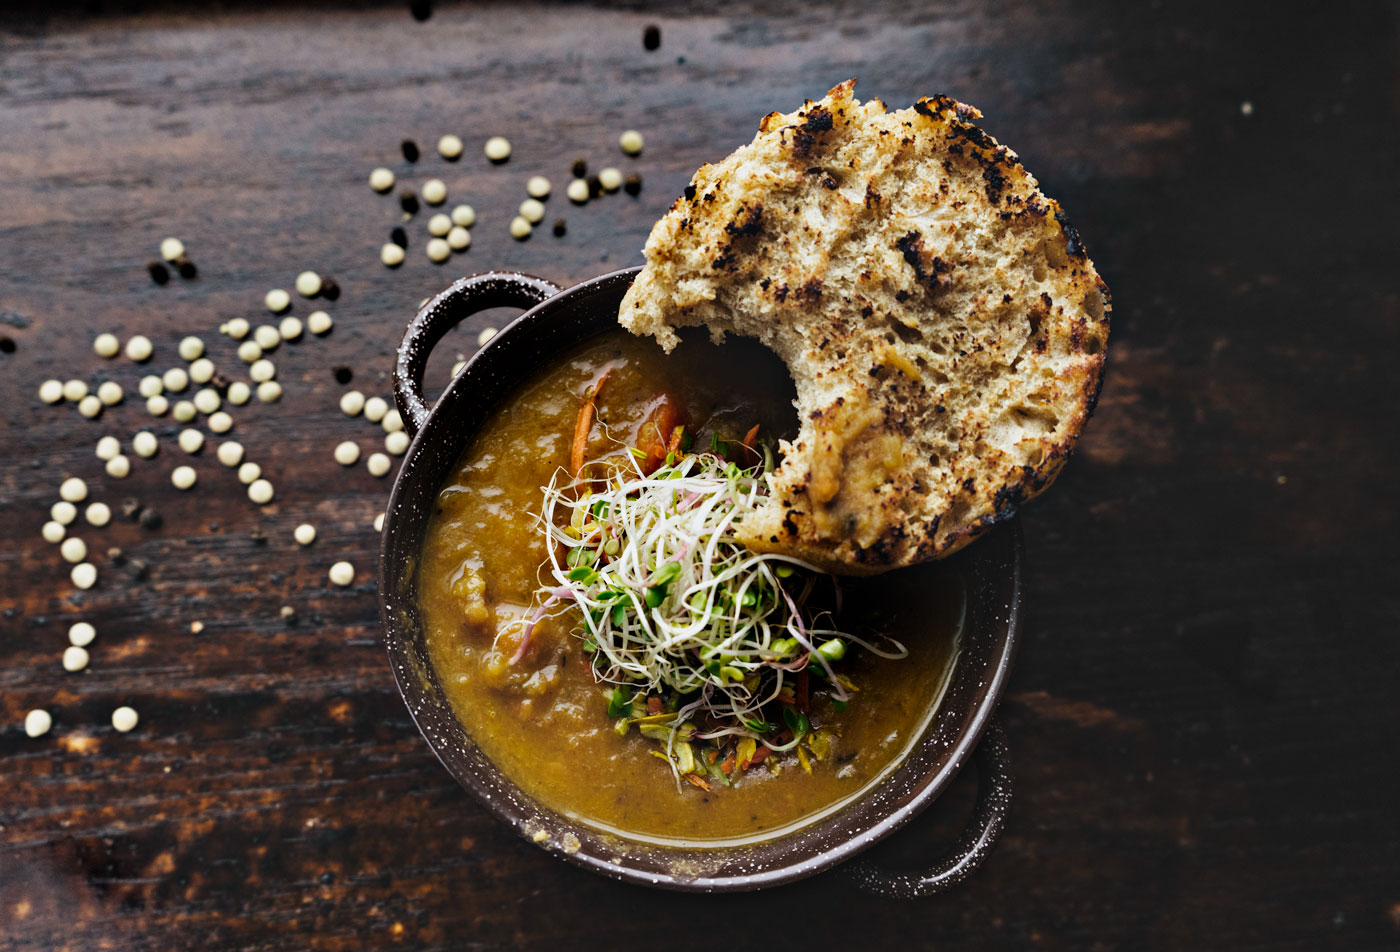 vegan-lentil-soup-babas-columbus-lunch-columbus-alive.jpg